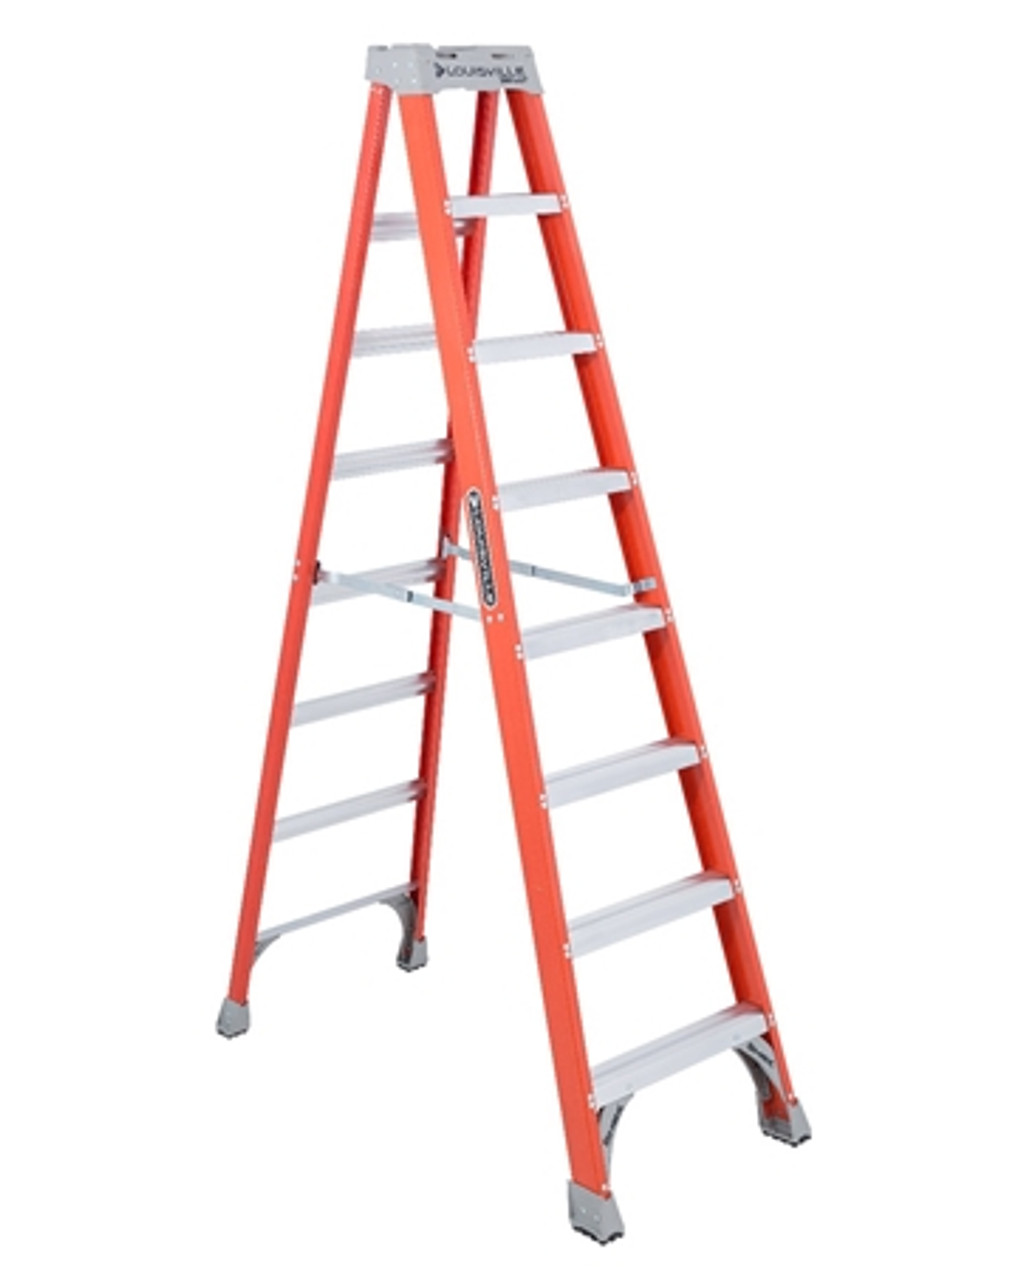 8' Fiberglass Step Ladder 300lb Capacity FS1508